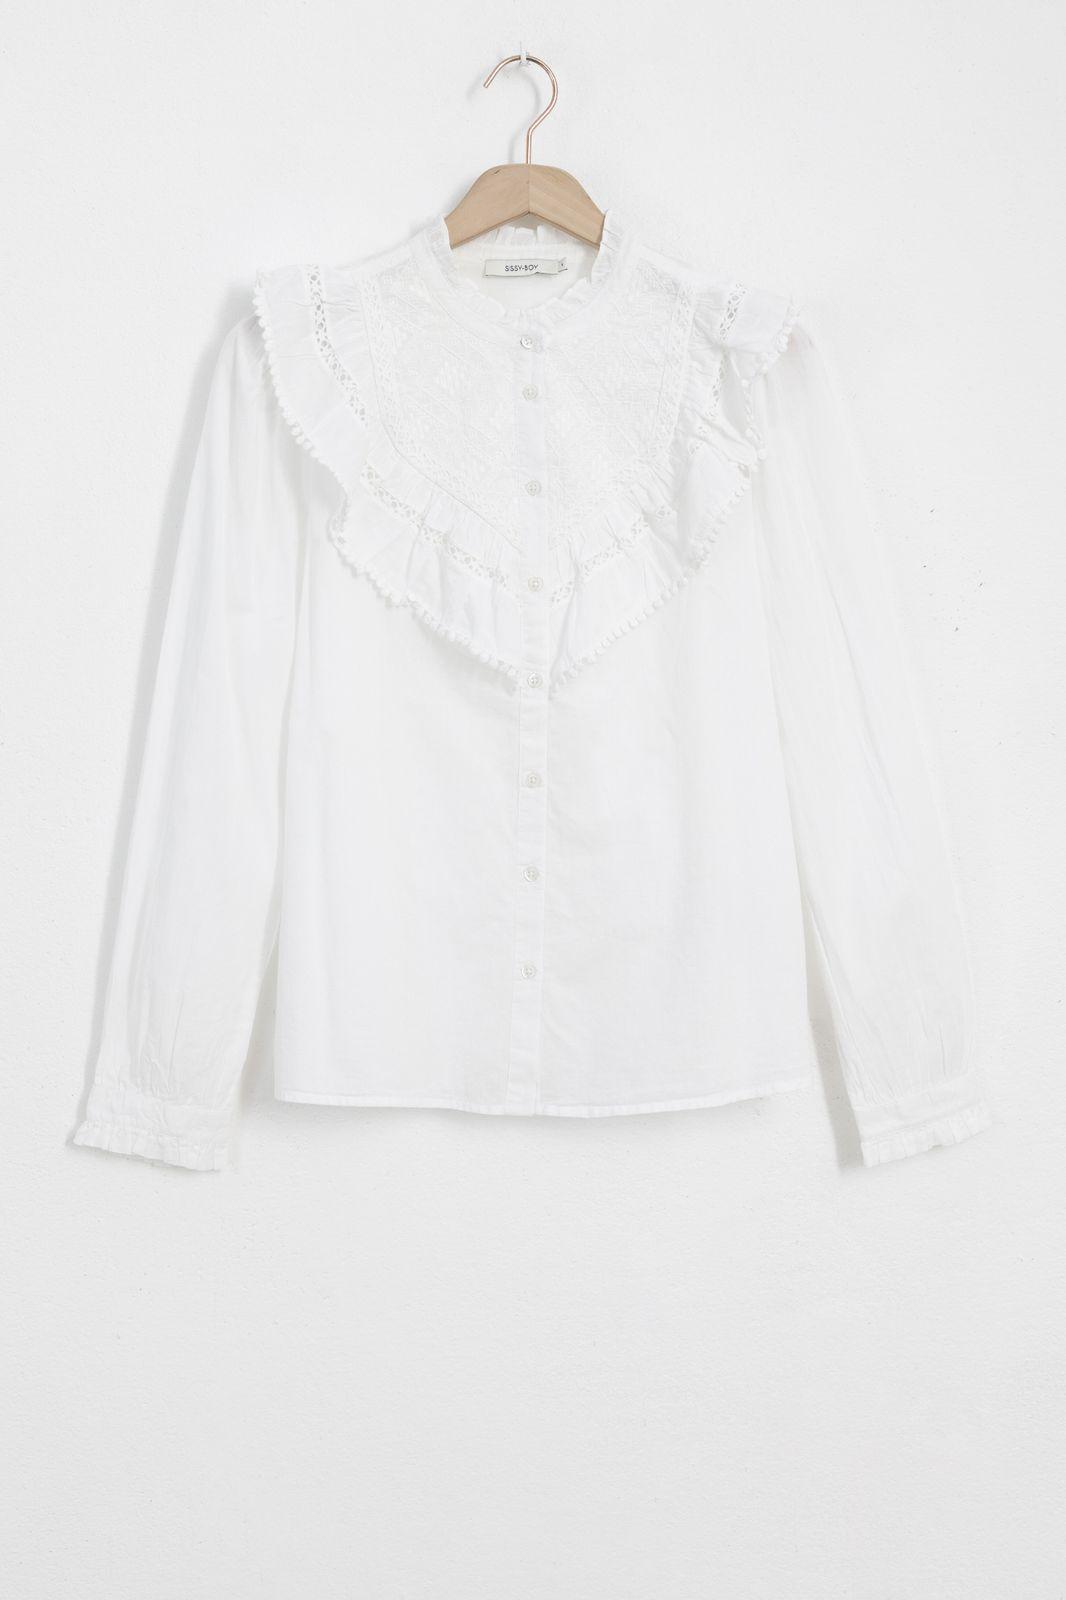 Witte blouse met kanten details en ruffles - Dames   Sissy-Boy